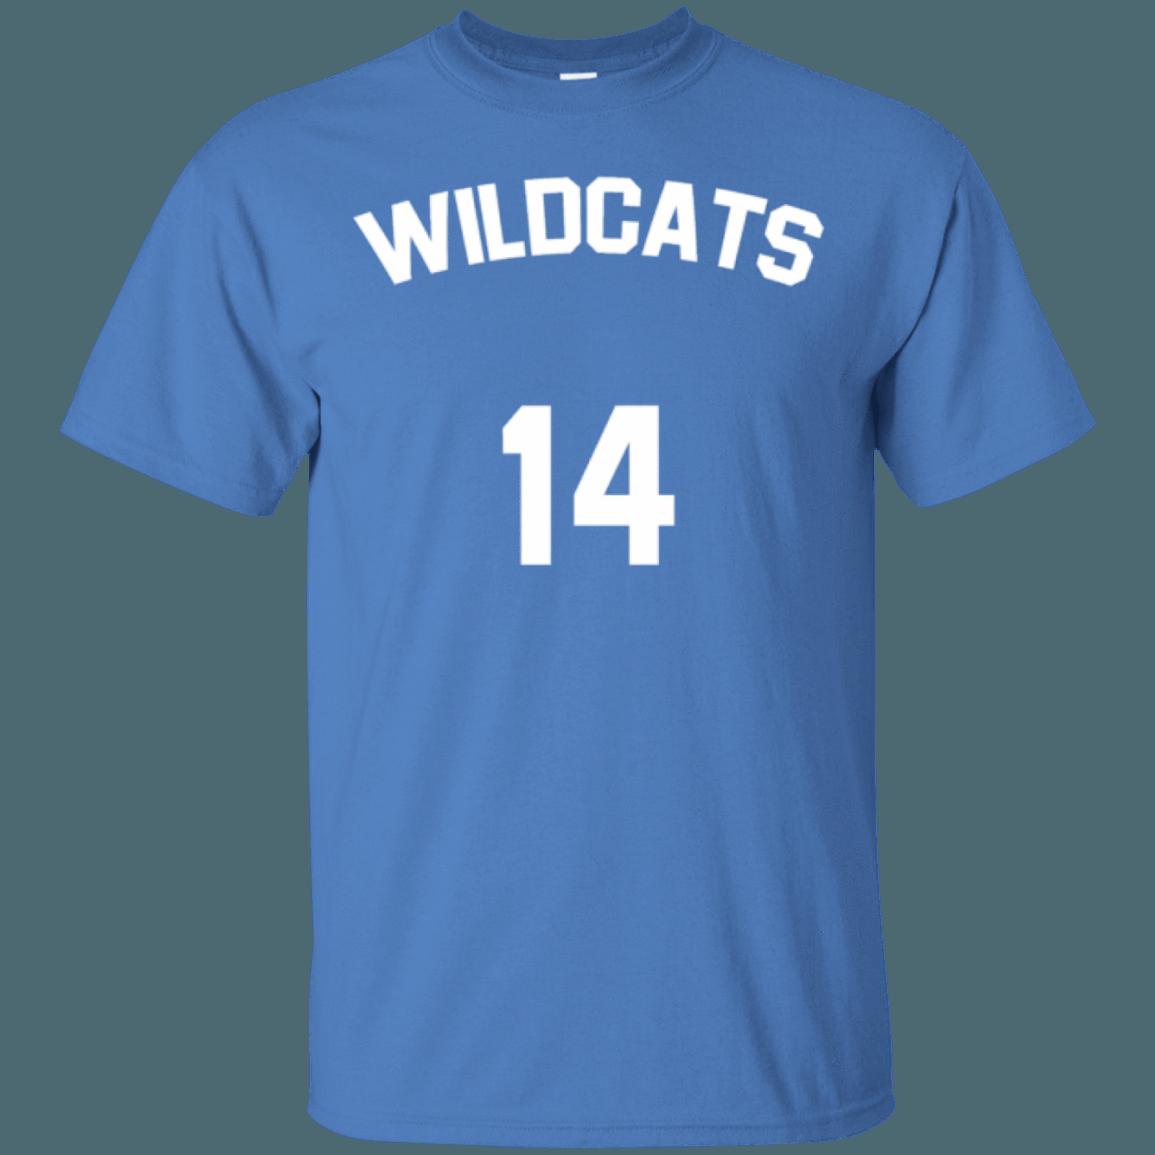 ffc5c95b2 Troy Bolton Wildcats Shirt 14